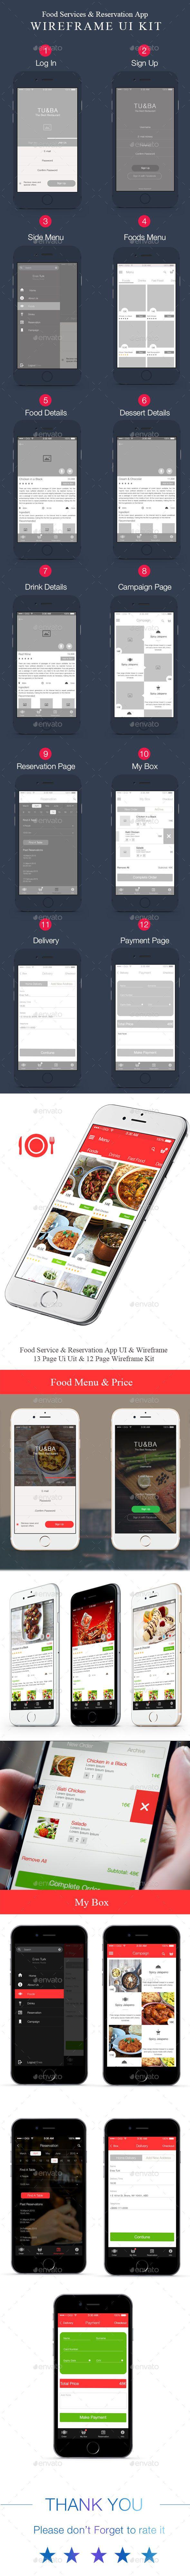 Food App UI & Wireframe Kit